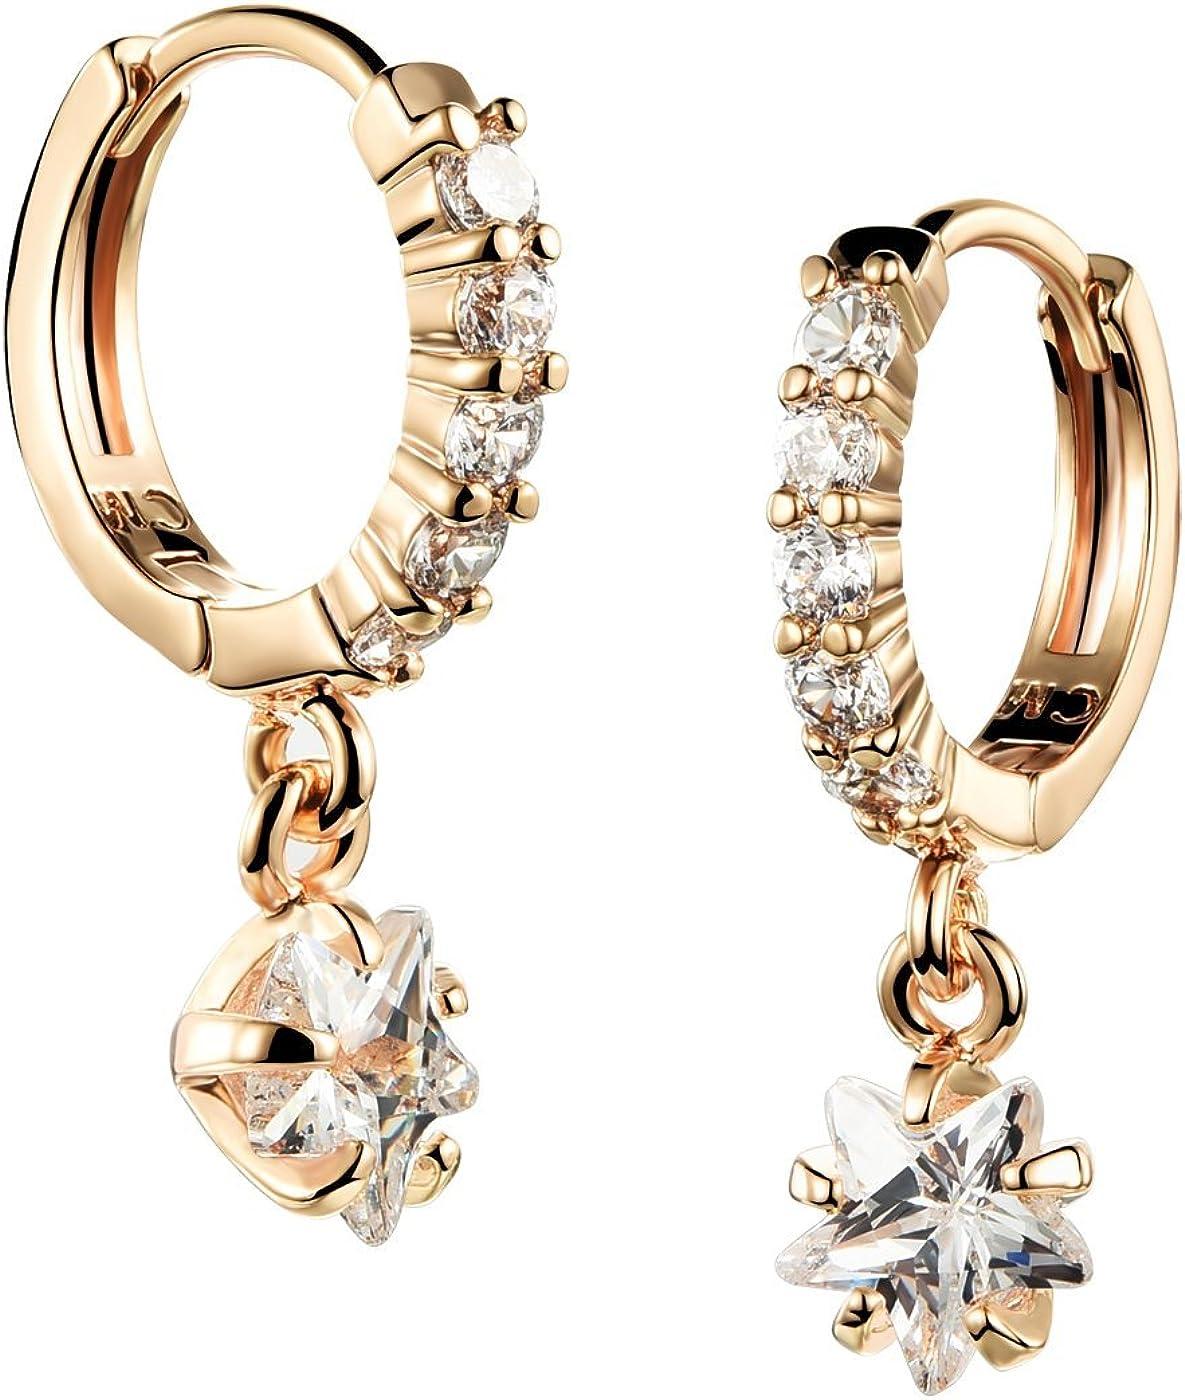 Tidoo Jewelry Charming Crystal Drop Earrings - Girl's 18k Gold Plated Dangle Earring